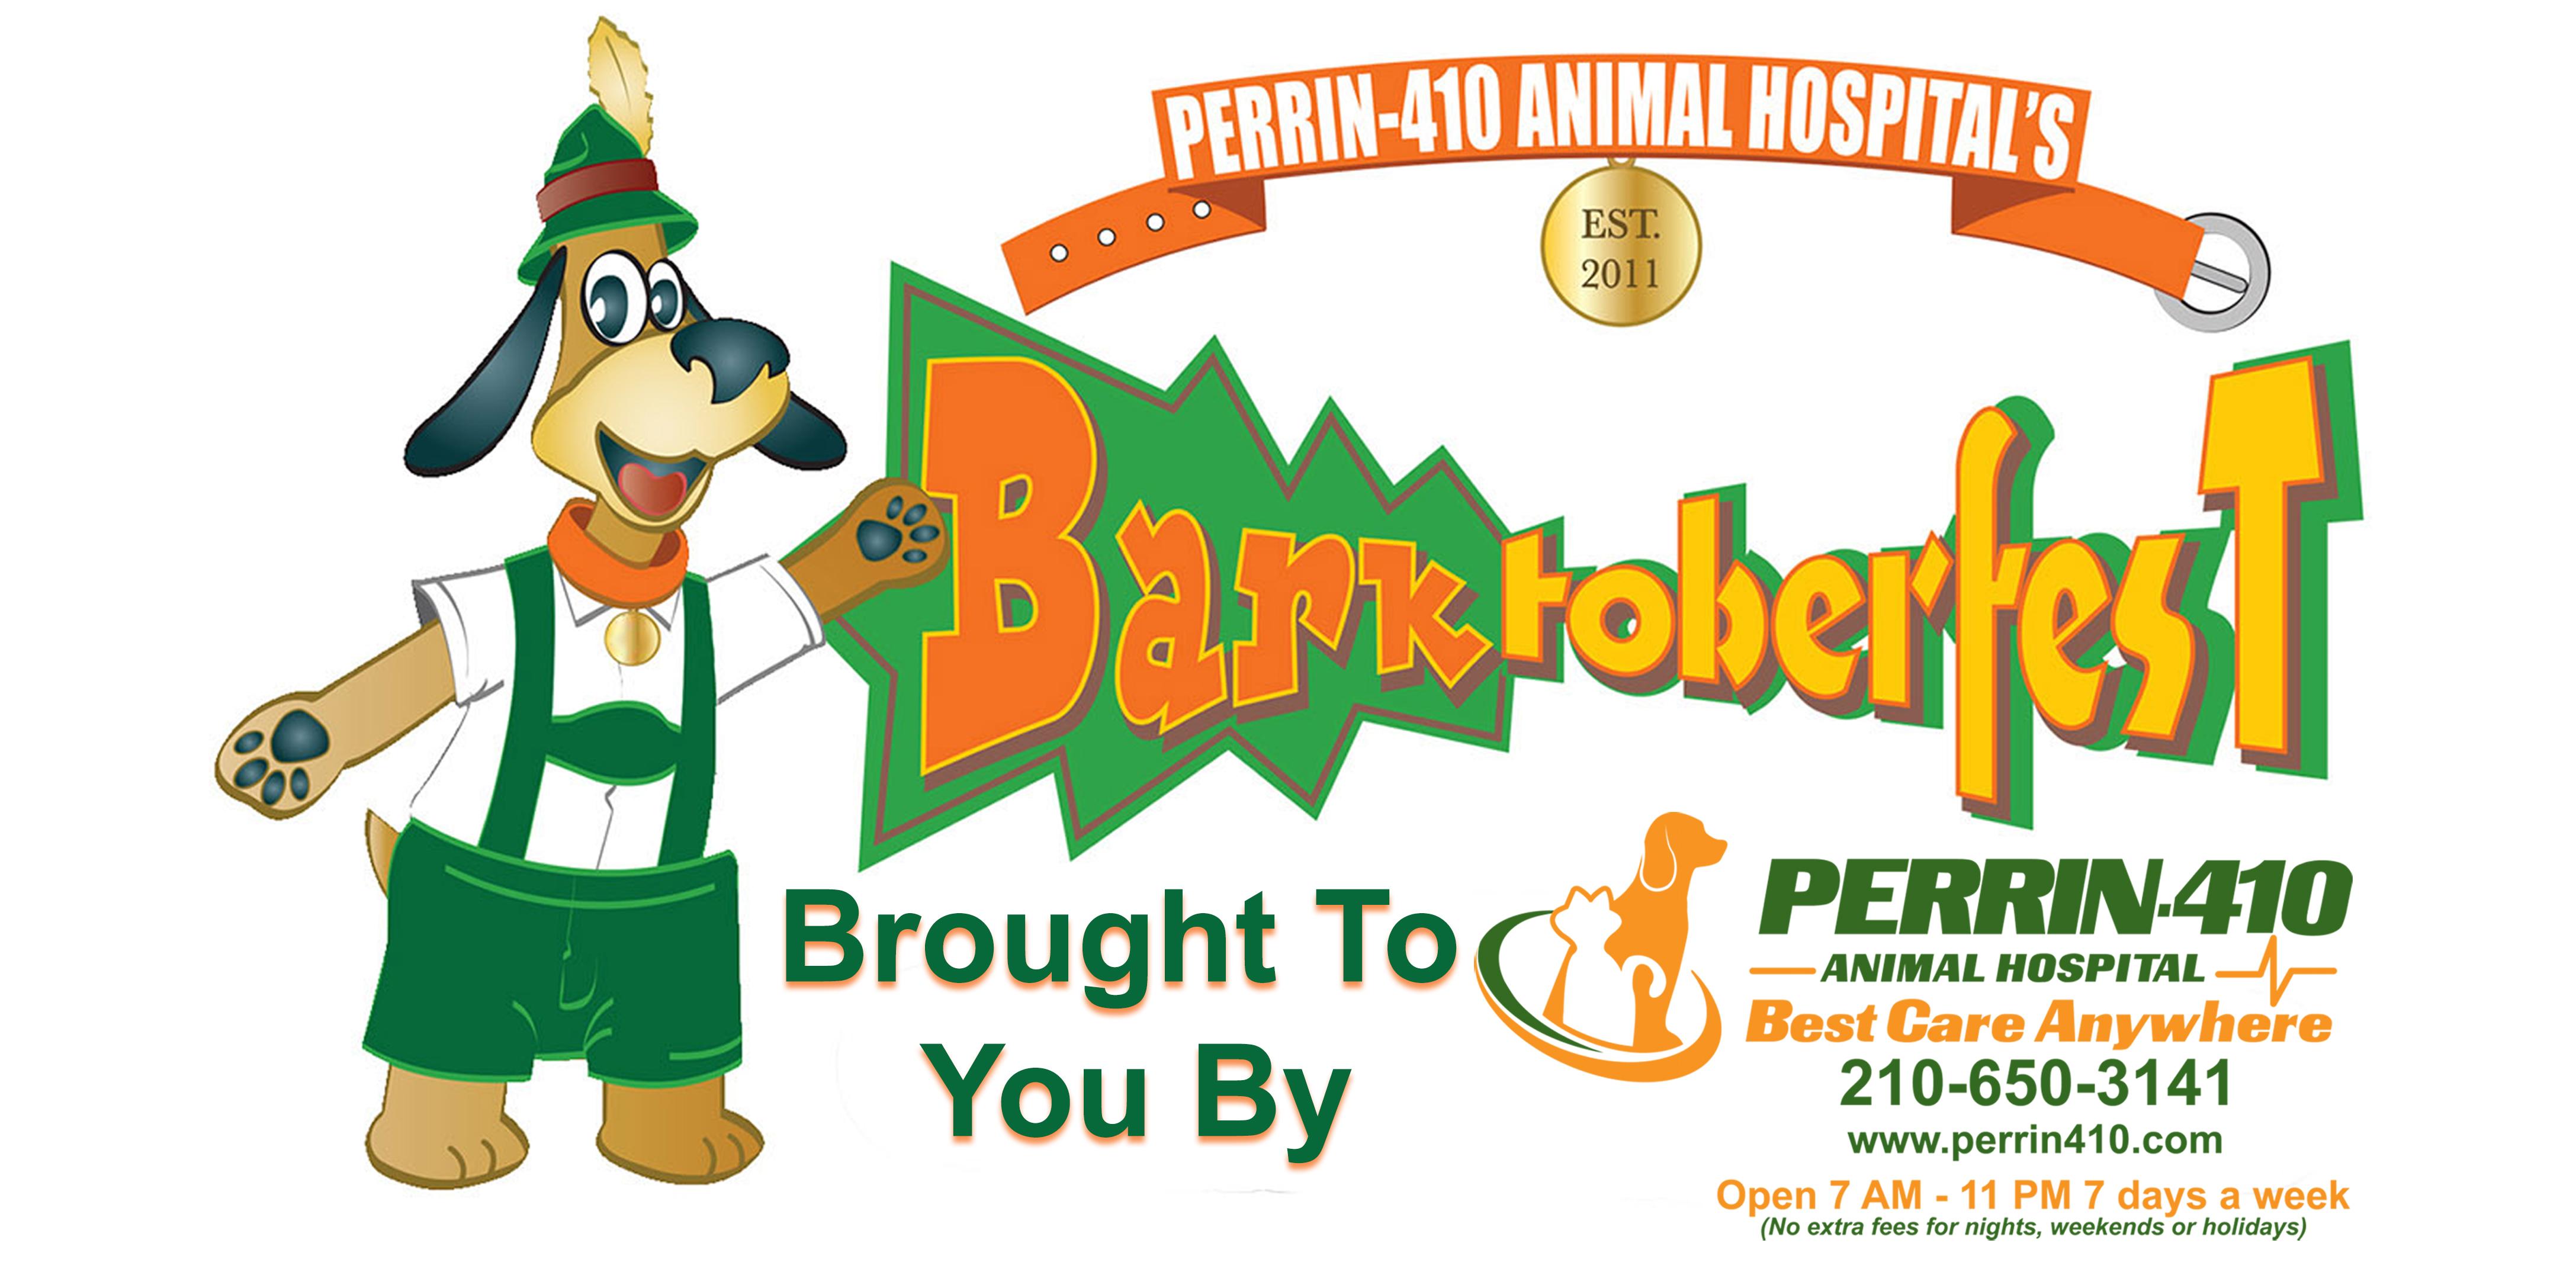 Perrin-410 Animal Hospital's 2019 Barktoberfest